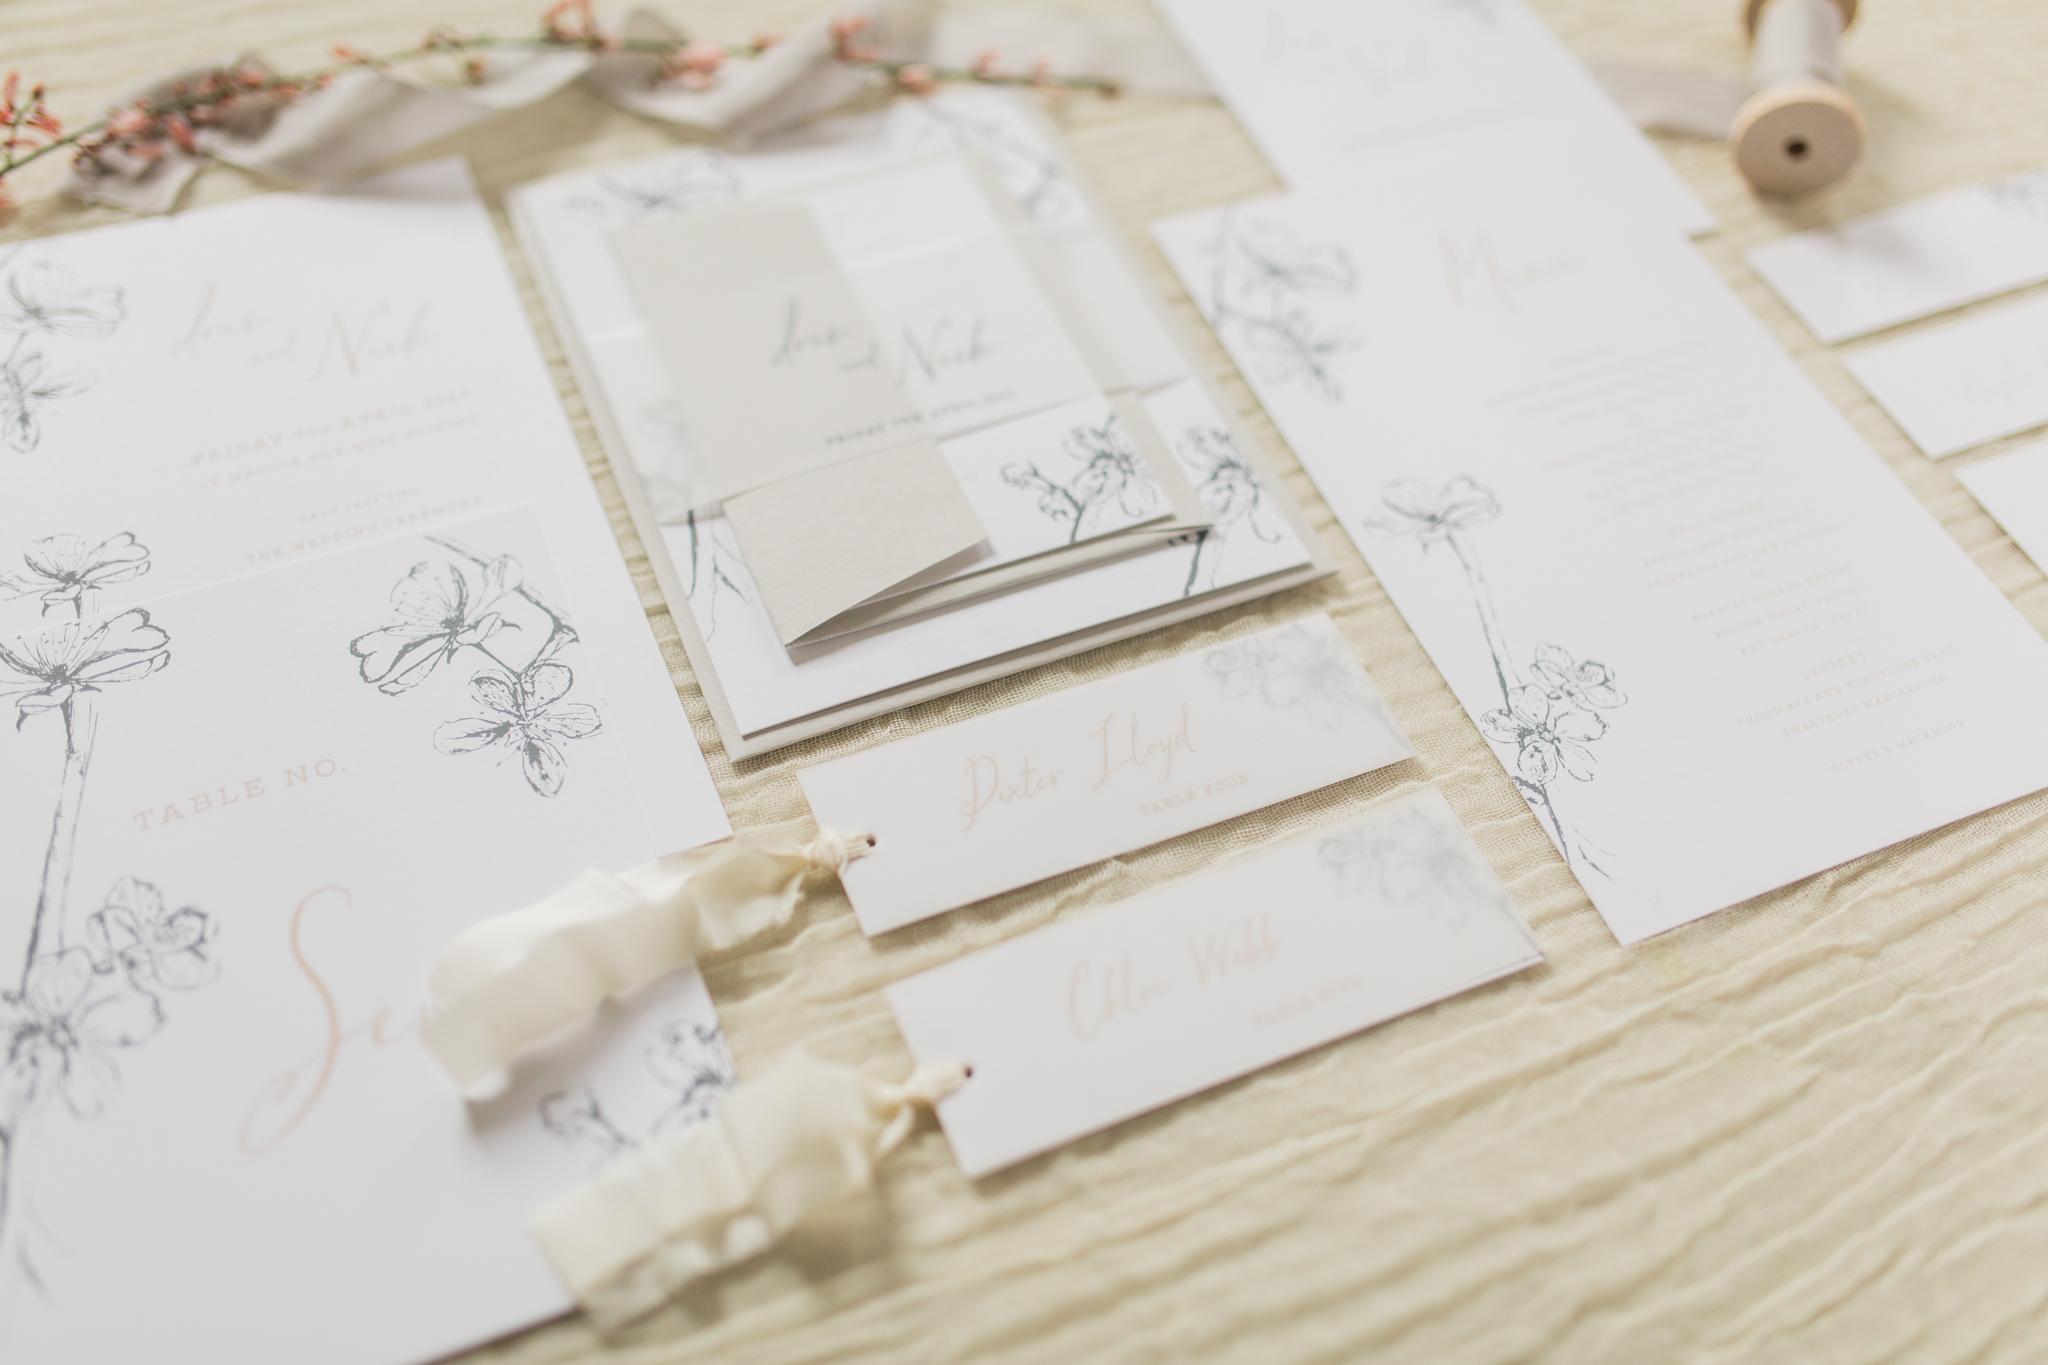 Inkflower Press Plum Blossom silkscreen printed wedding stationery - Blush Slate